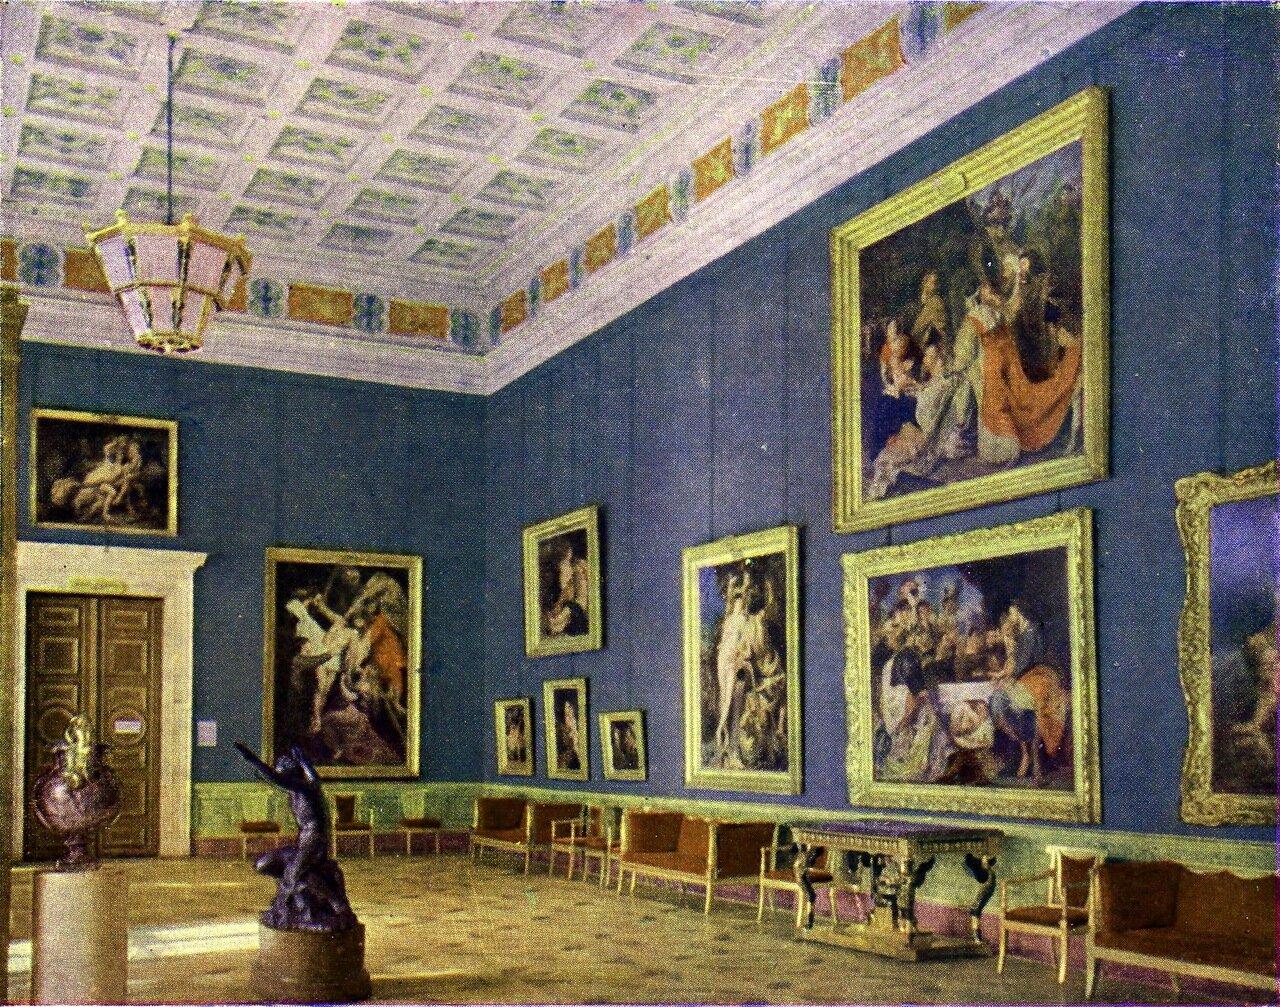 Фламандское искусство XVII в. Зал Рубенса